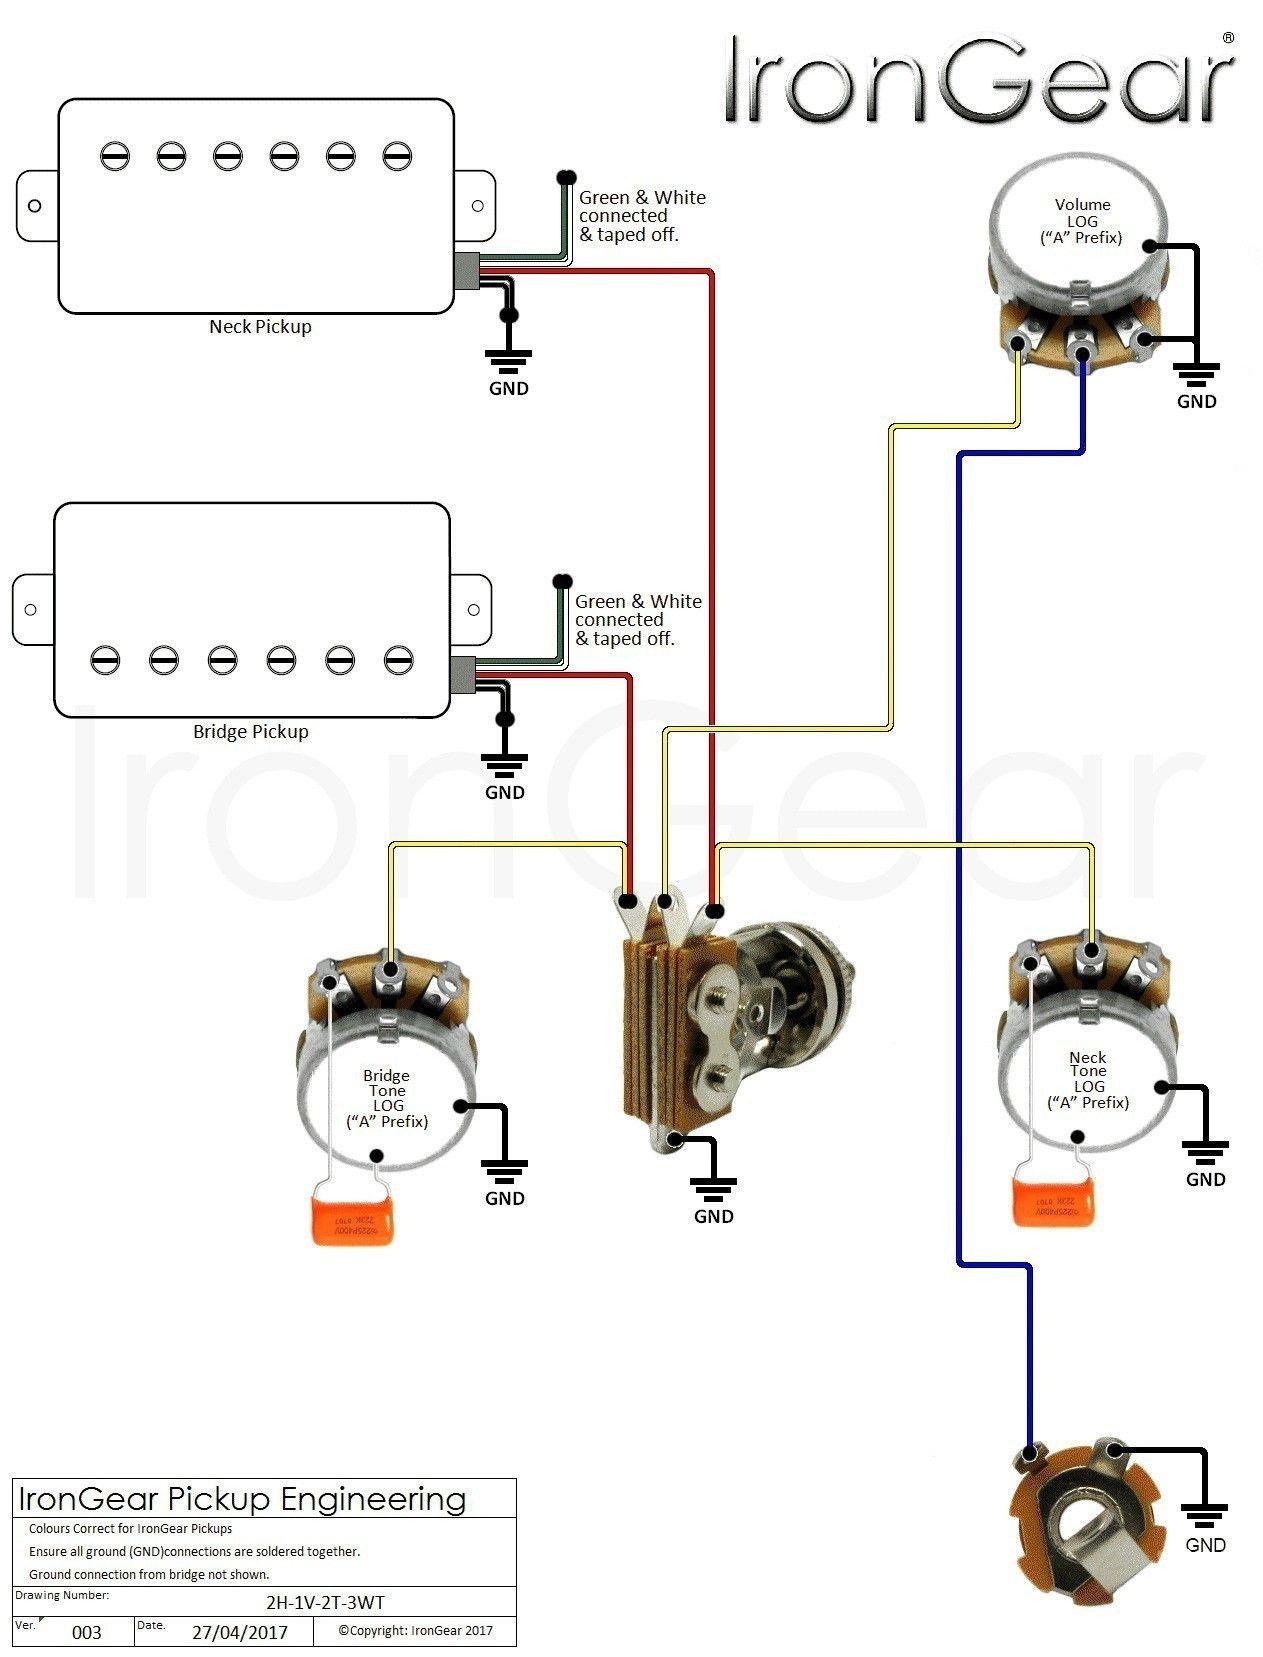 Guitar Wiring Diagram 2 Humbucker 1 Volume 1 Tone In 2020